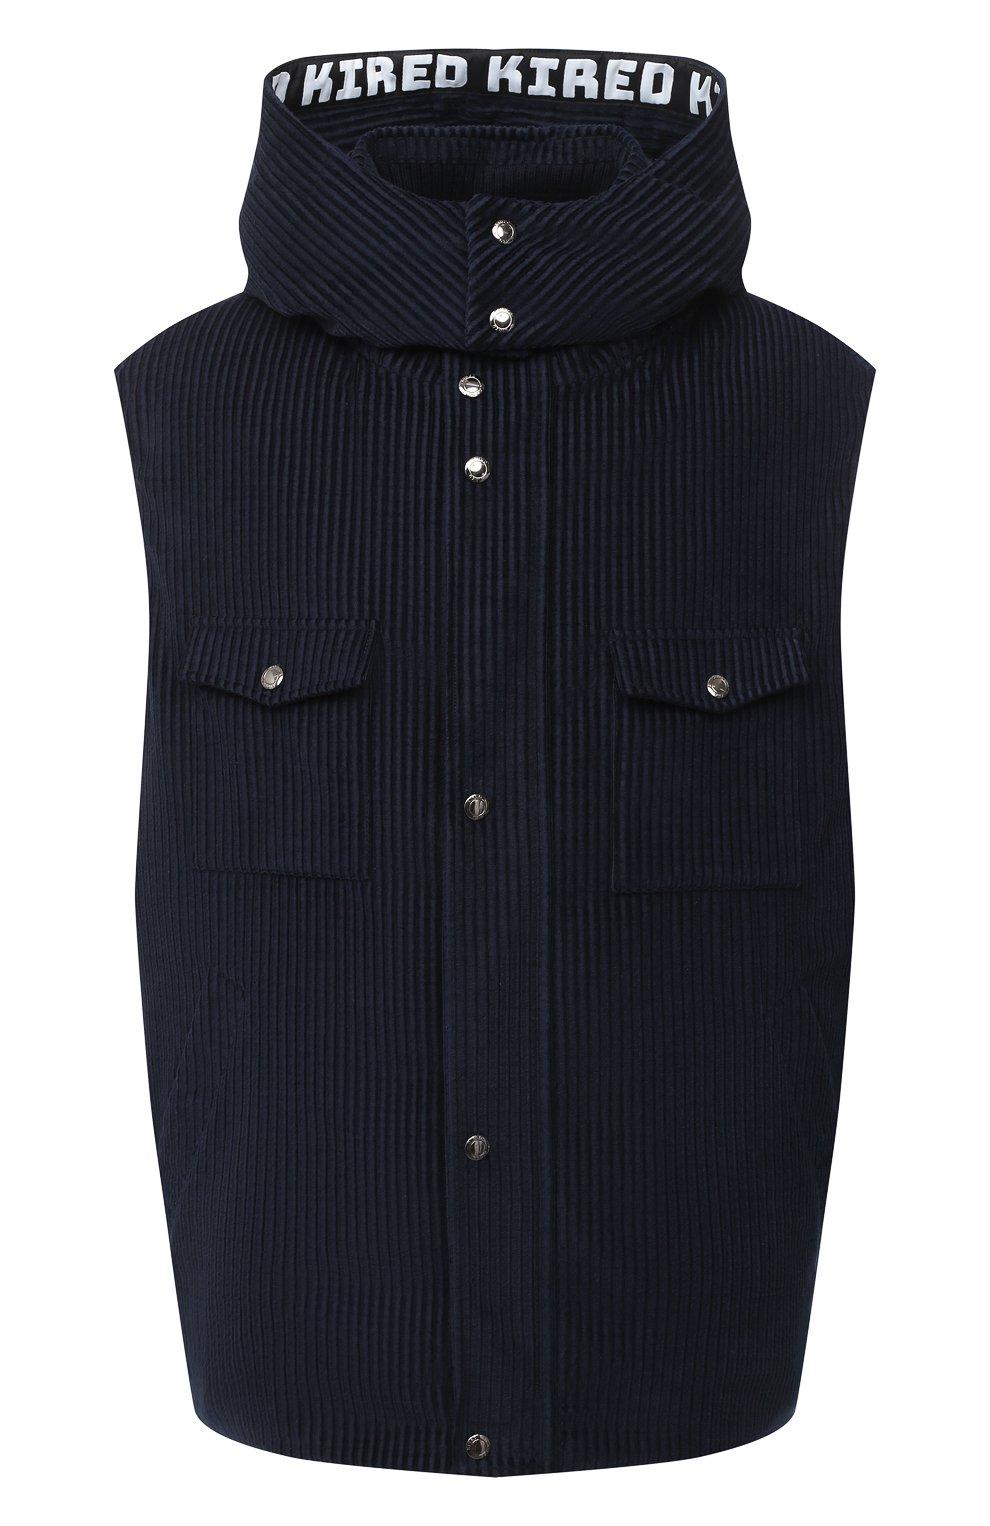 Мужской пуховый жилет KIRED синего цвета, арт. WBEARW7204001000/62-72 | Фото 1